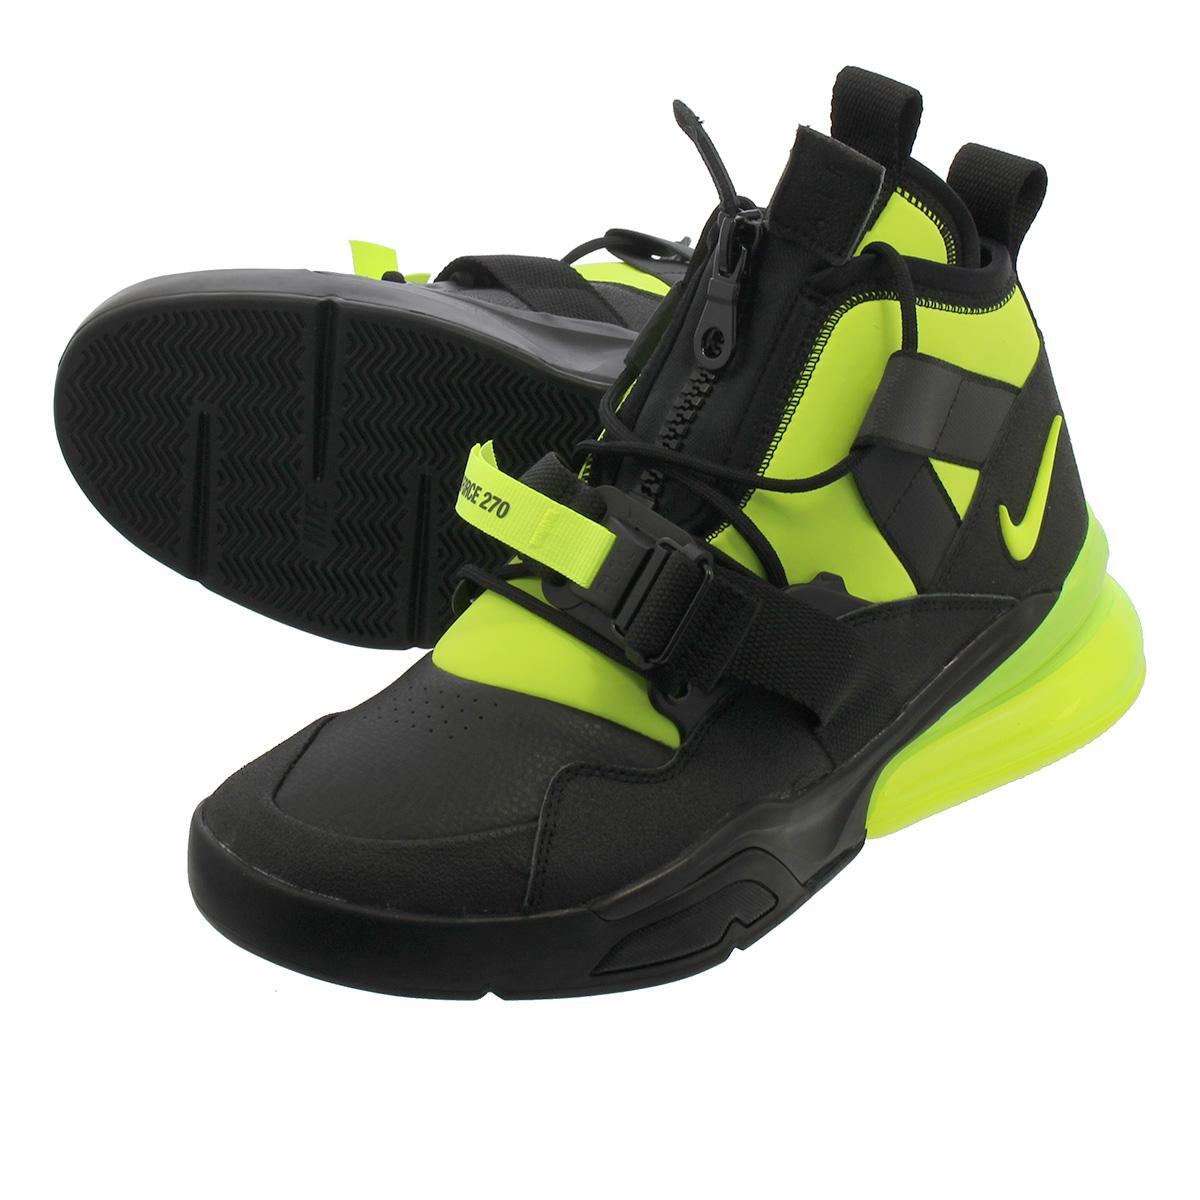 on sale 3b4ae f0cee NIKE AIR FORCE 270 UTILITY Nike air force 270 utility BLACK VOLT aq0572-001